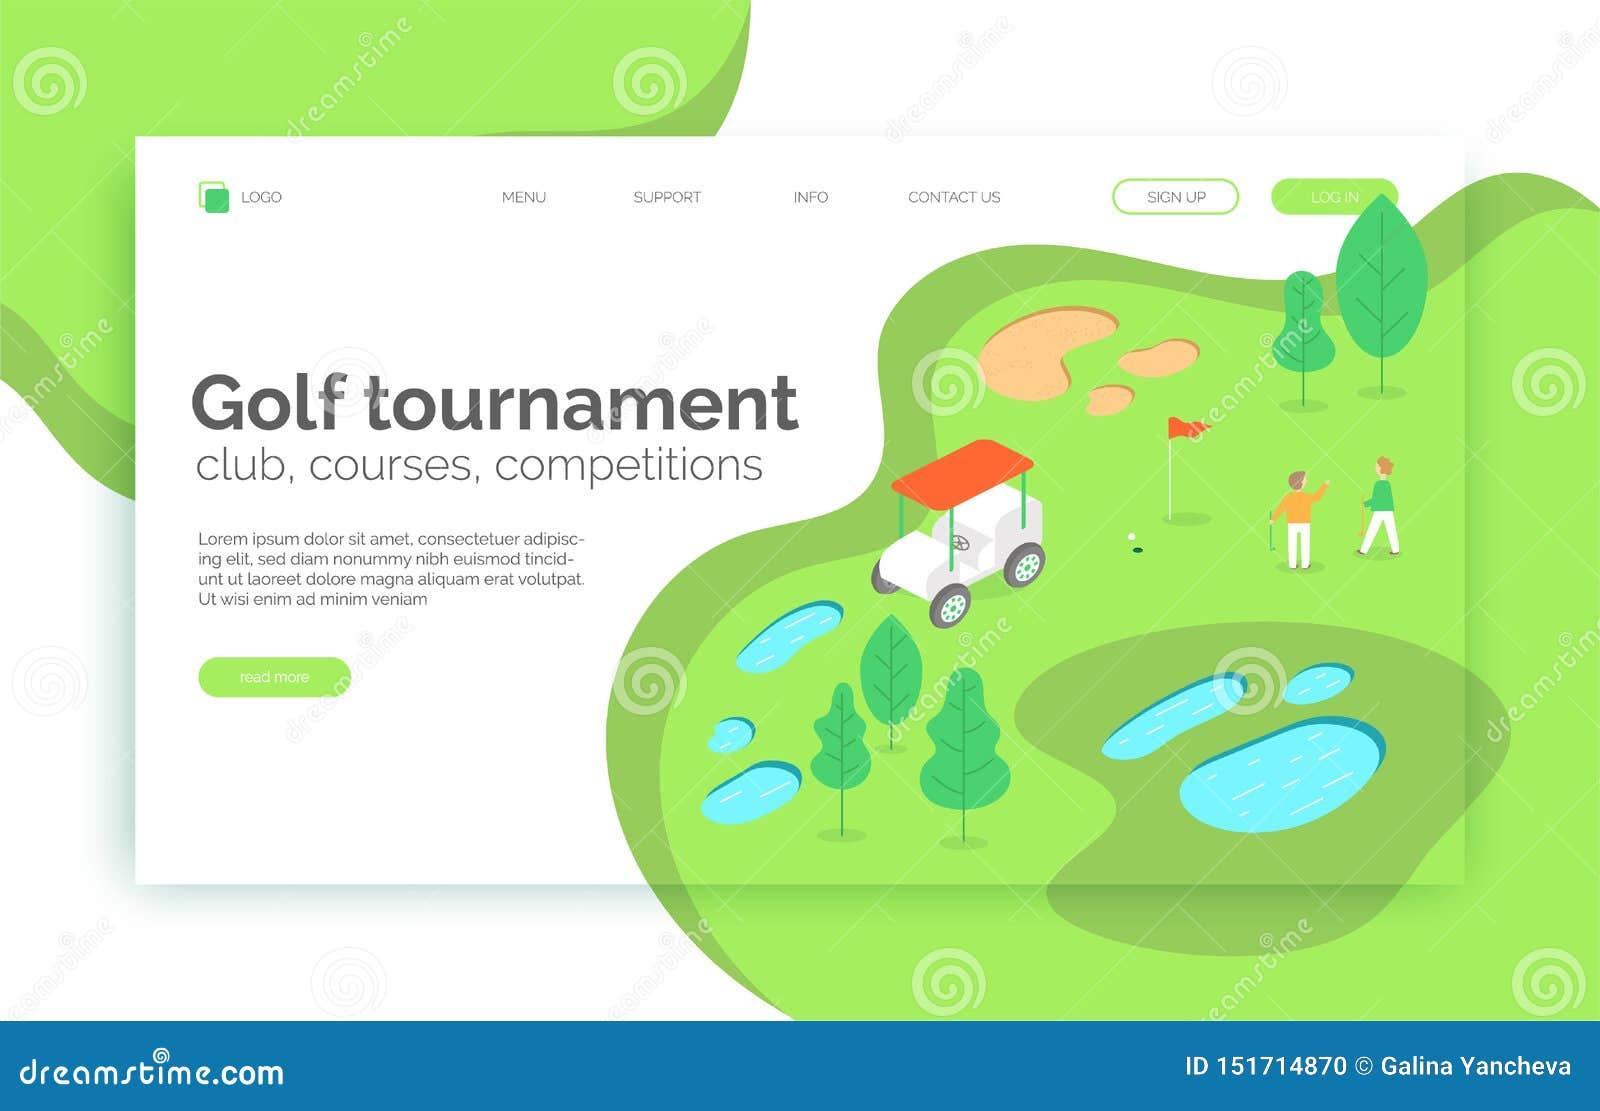 Golftoernooien, cursussen, de concurrentie, schoolwebsite, landingspagina, presentatie, lay-out, app, banner